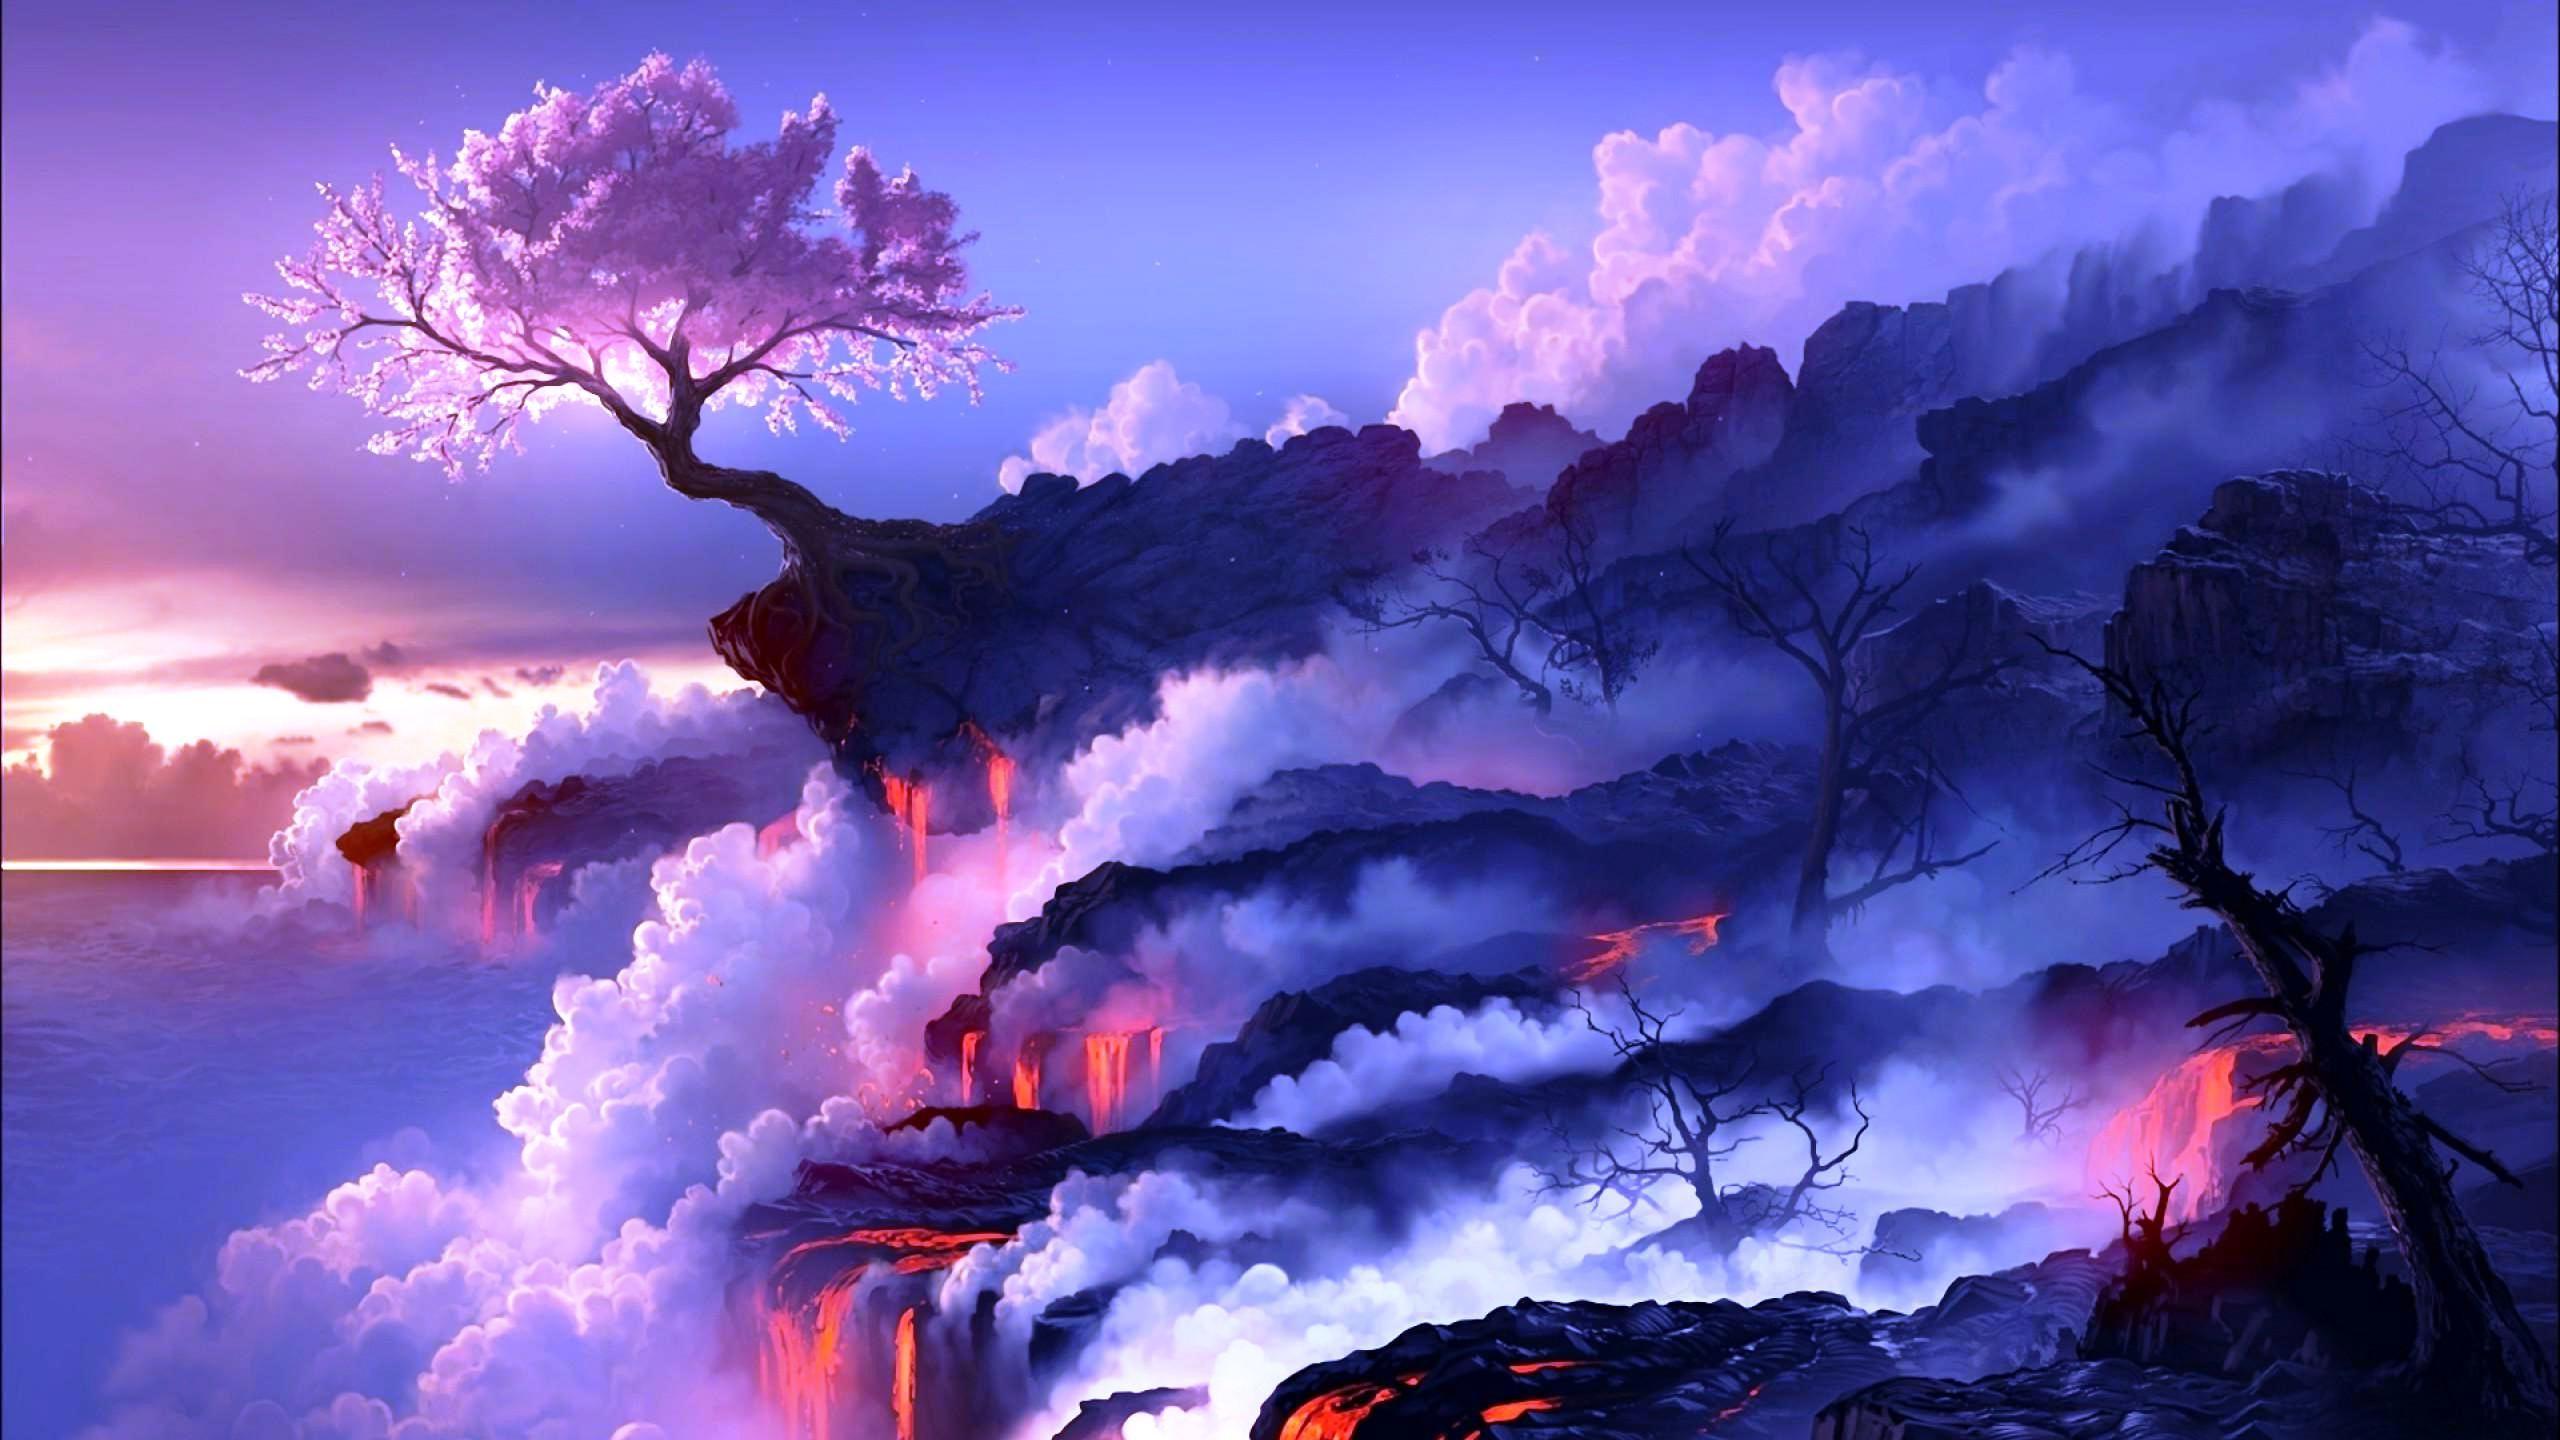 Volcano Full Hd Wallpaper Anime Scenery Wallpaper Scenery Wallpaper Fantasy Landscape